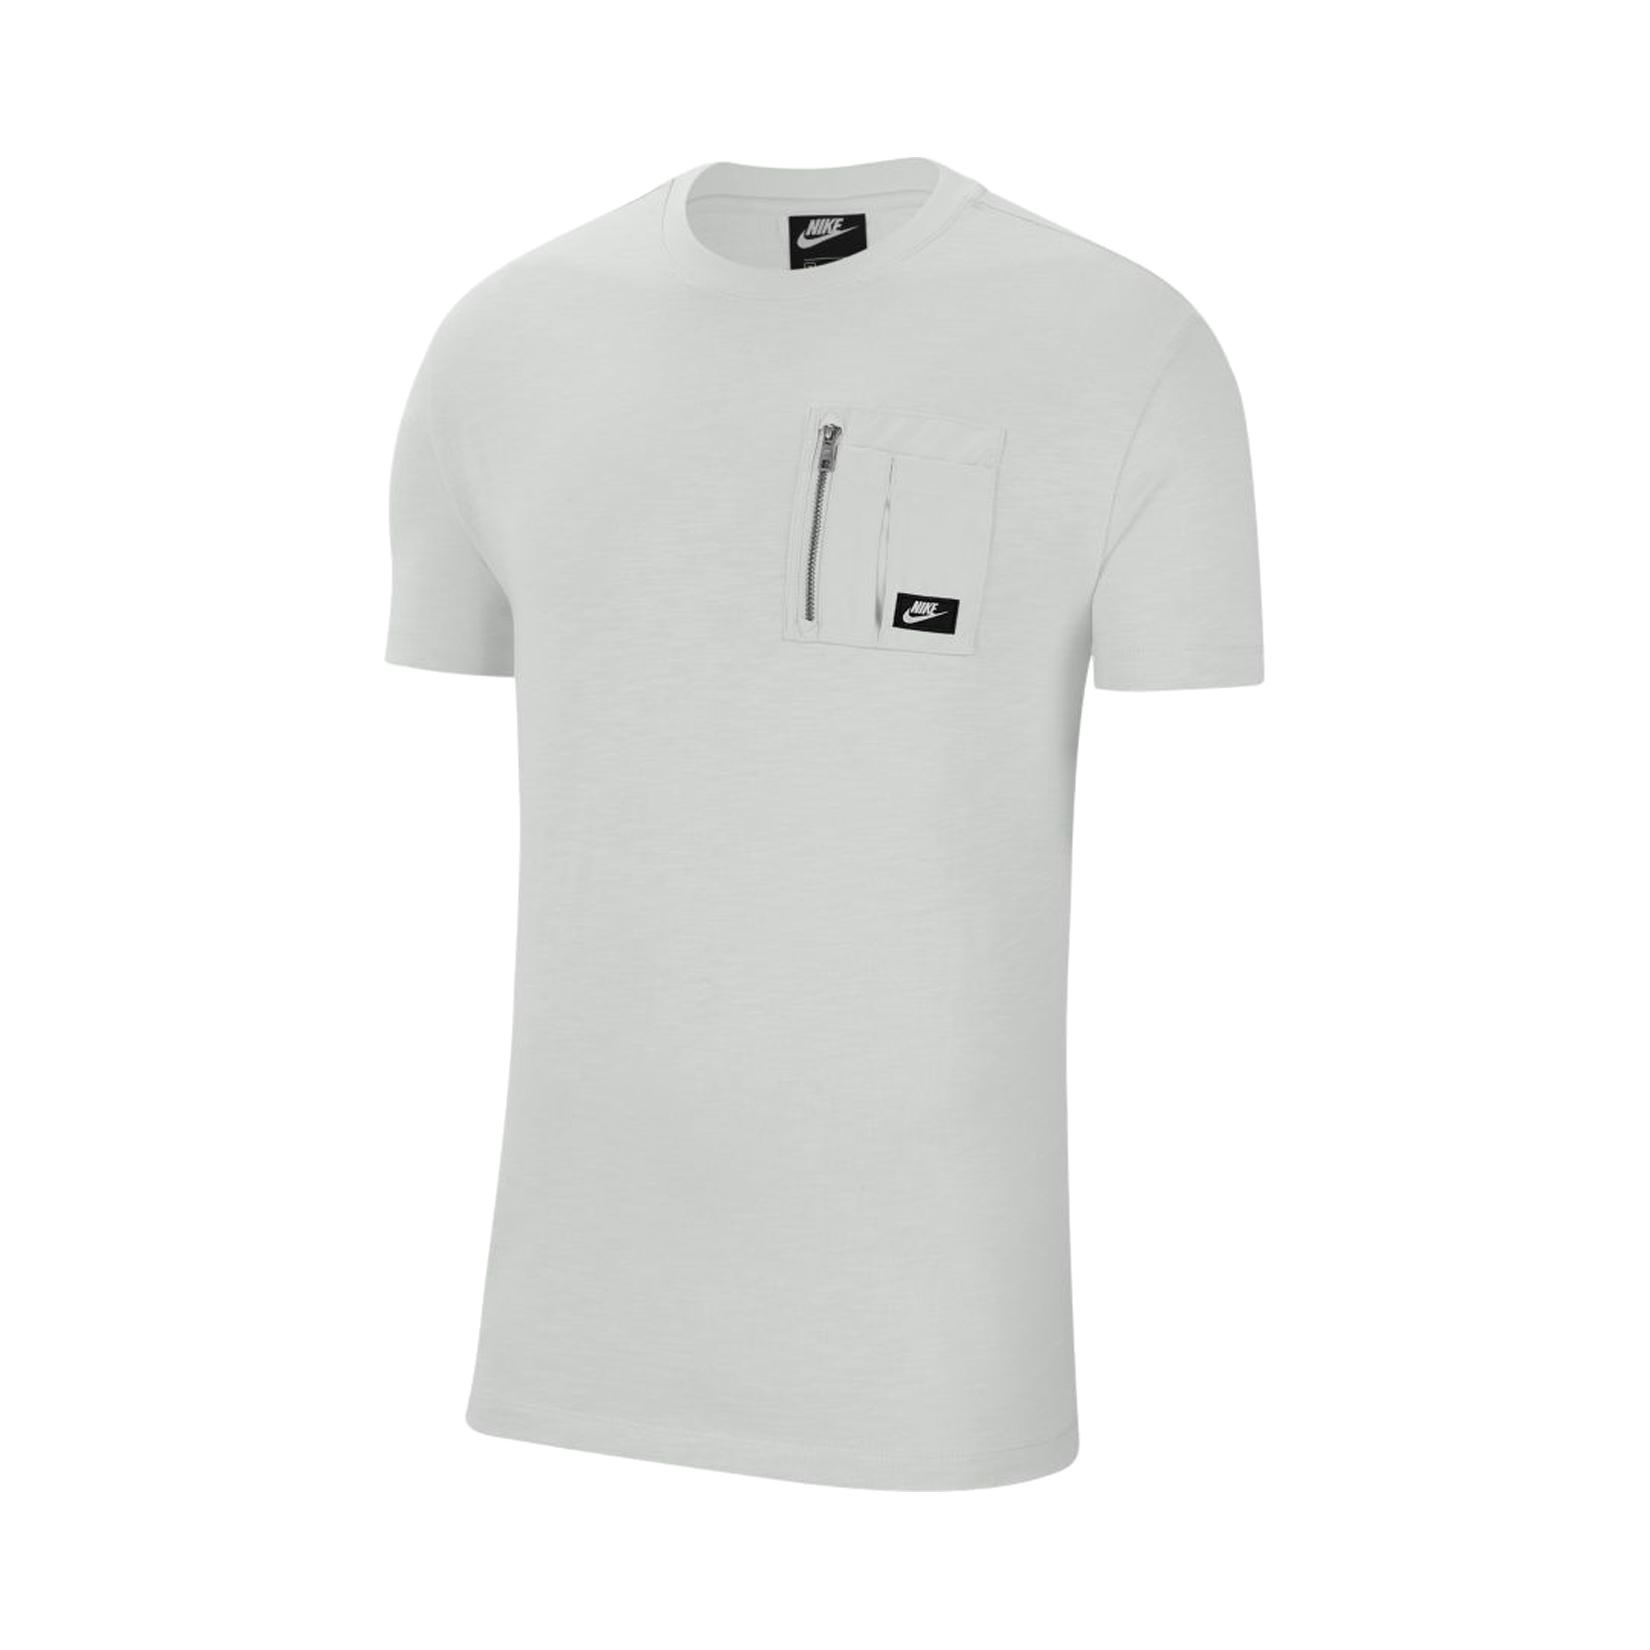 Nike Sportswear Short Sleeve White